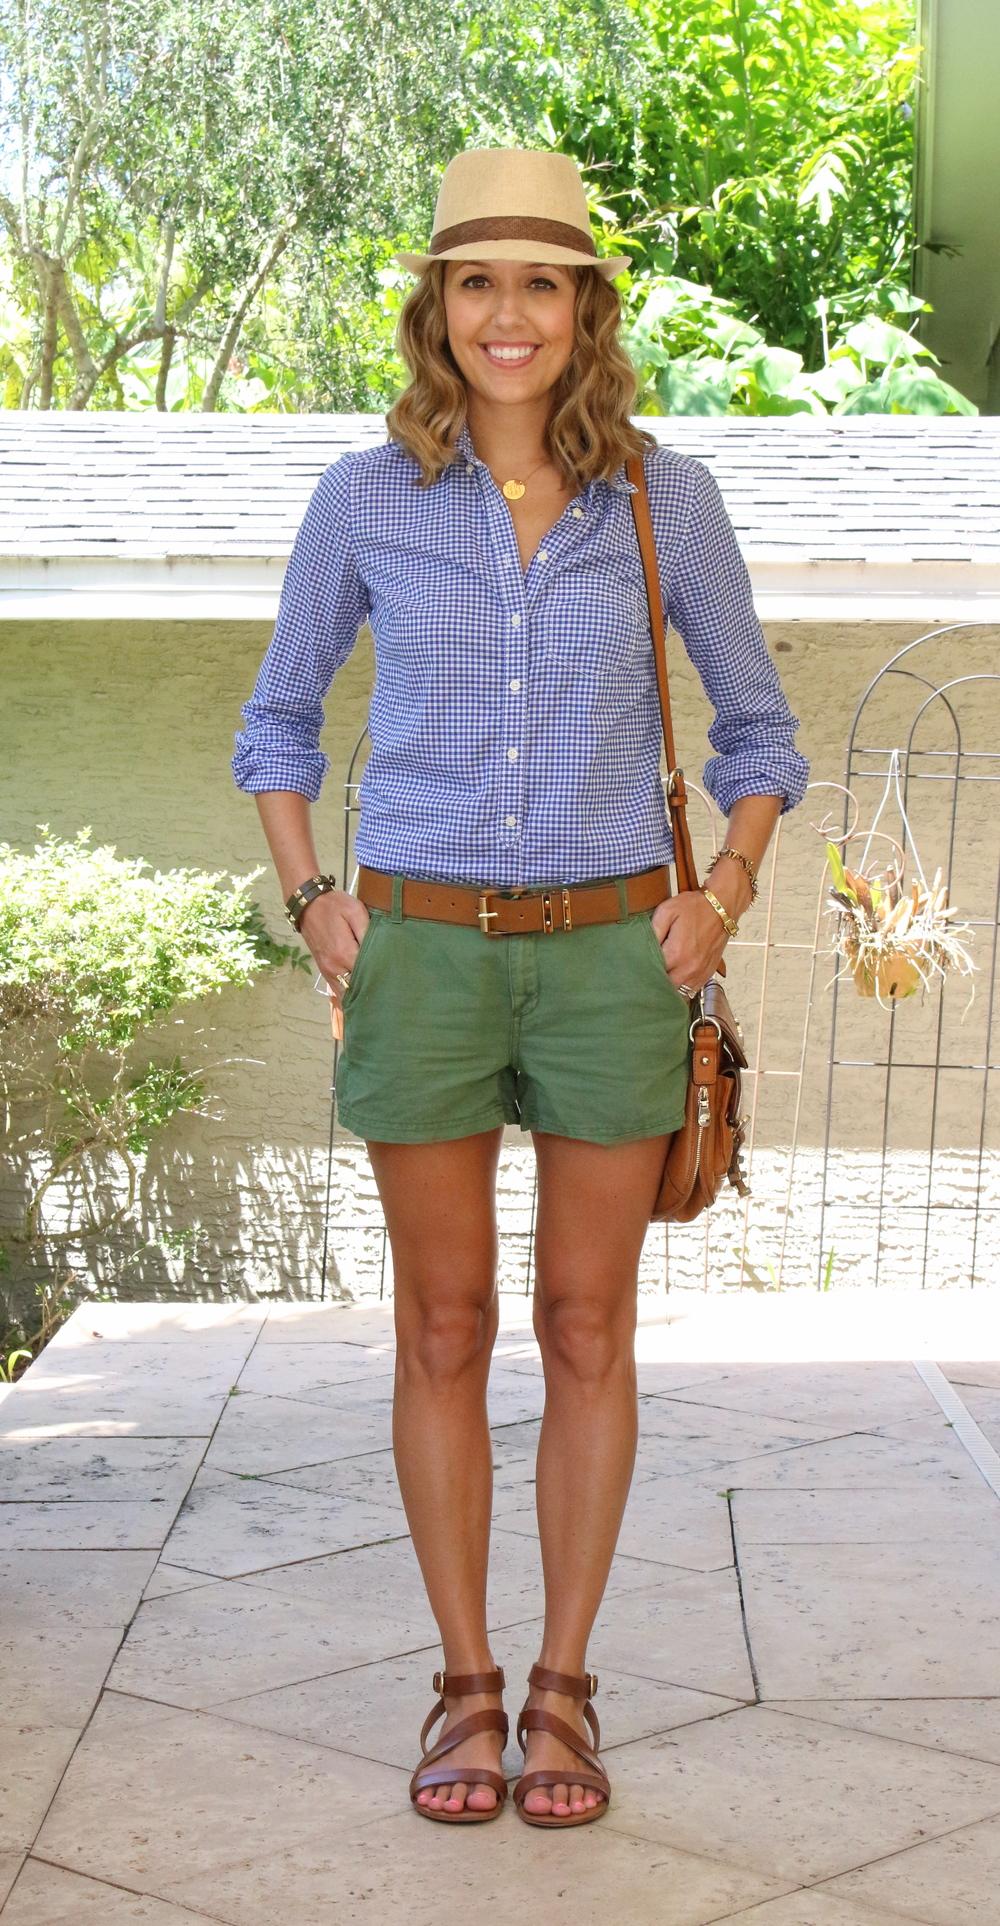 Todayu0026#39;s Everyday Fashion Green Shorts U2014 Ju0026#39;s Everyday Fashion